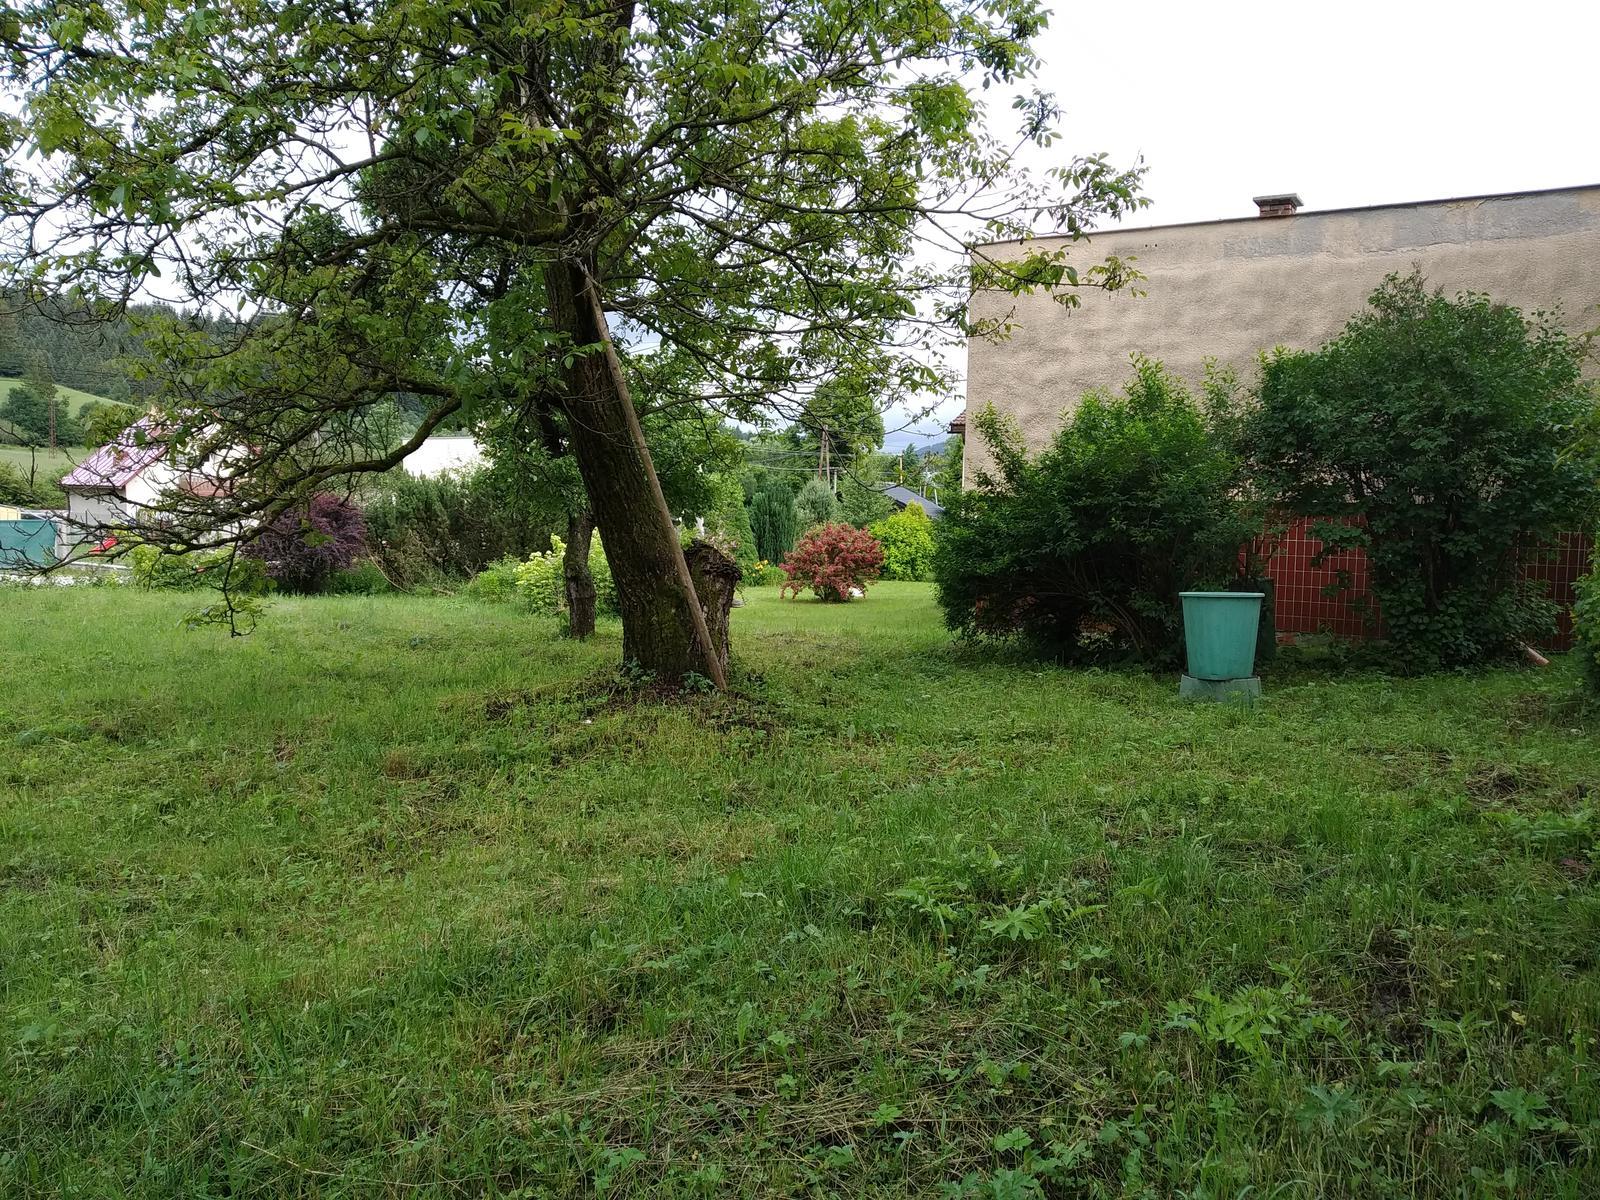 Babkina záhrada - Orech v strede, napravo zlatý dážď  a orgován.